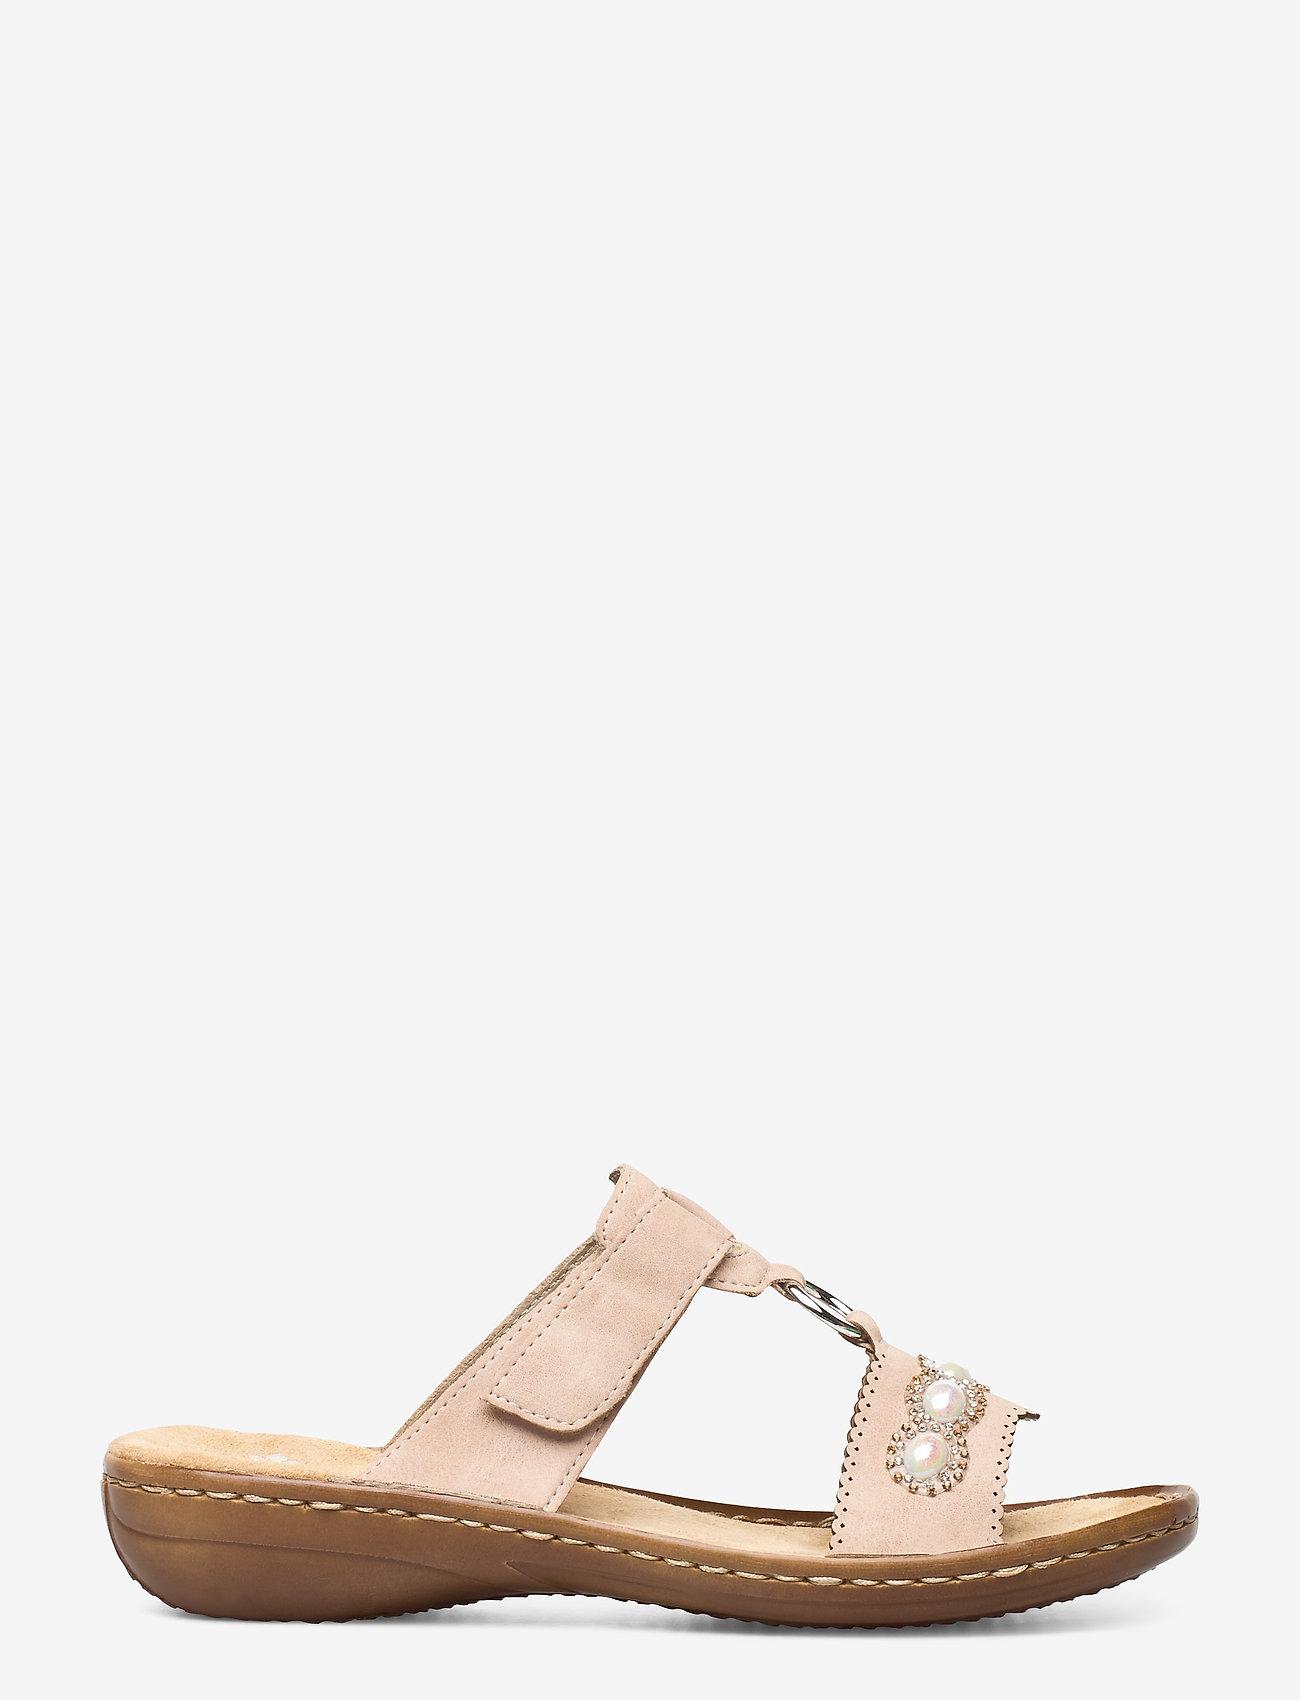 Rieker - 608A3-31 - flat sandals - rosa